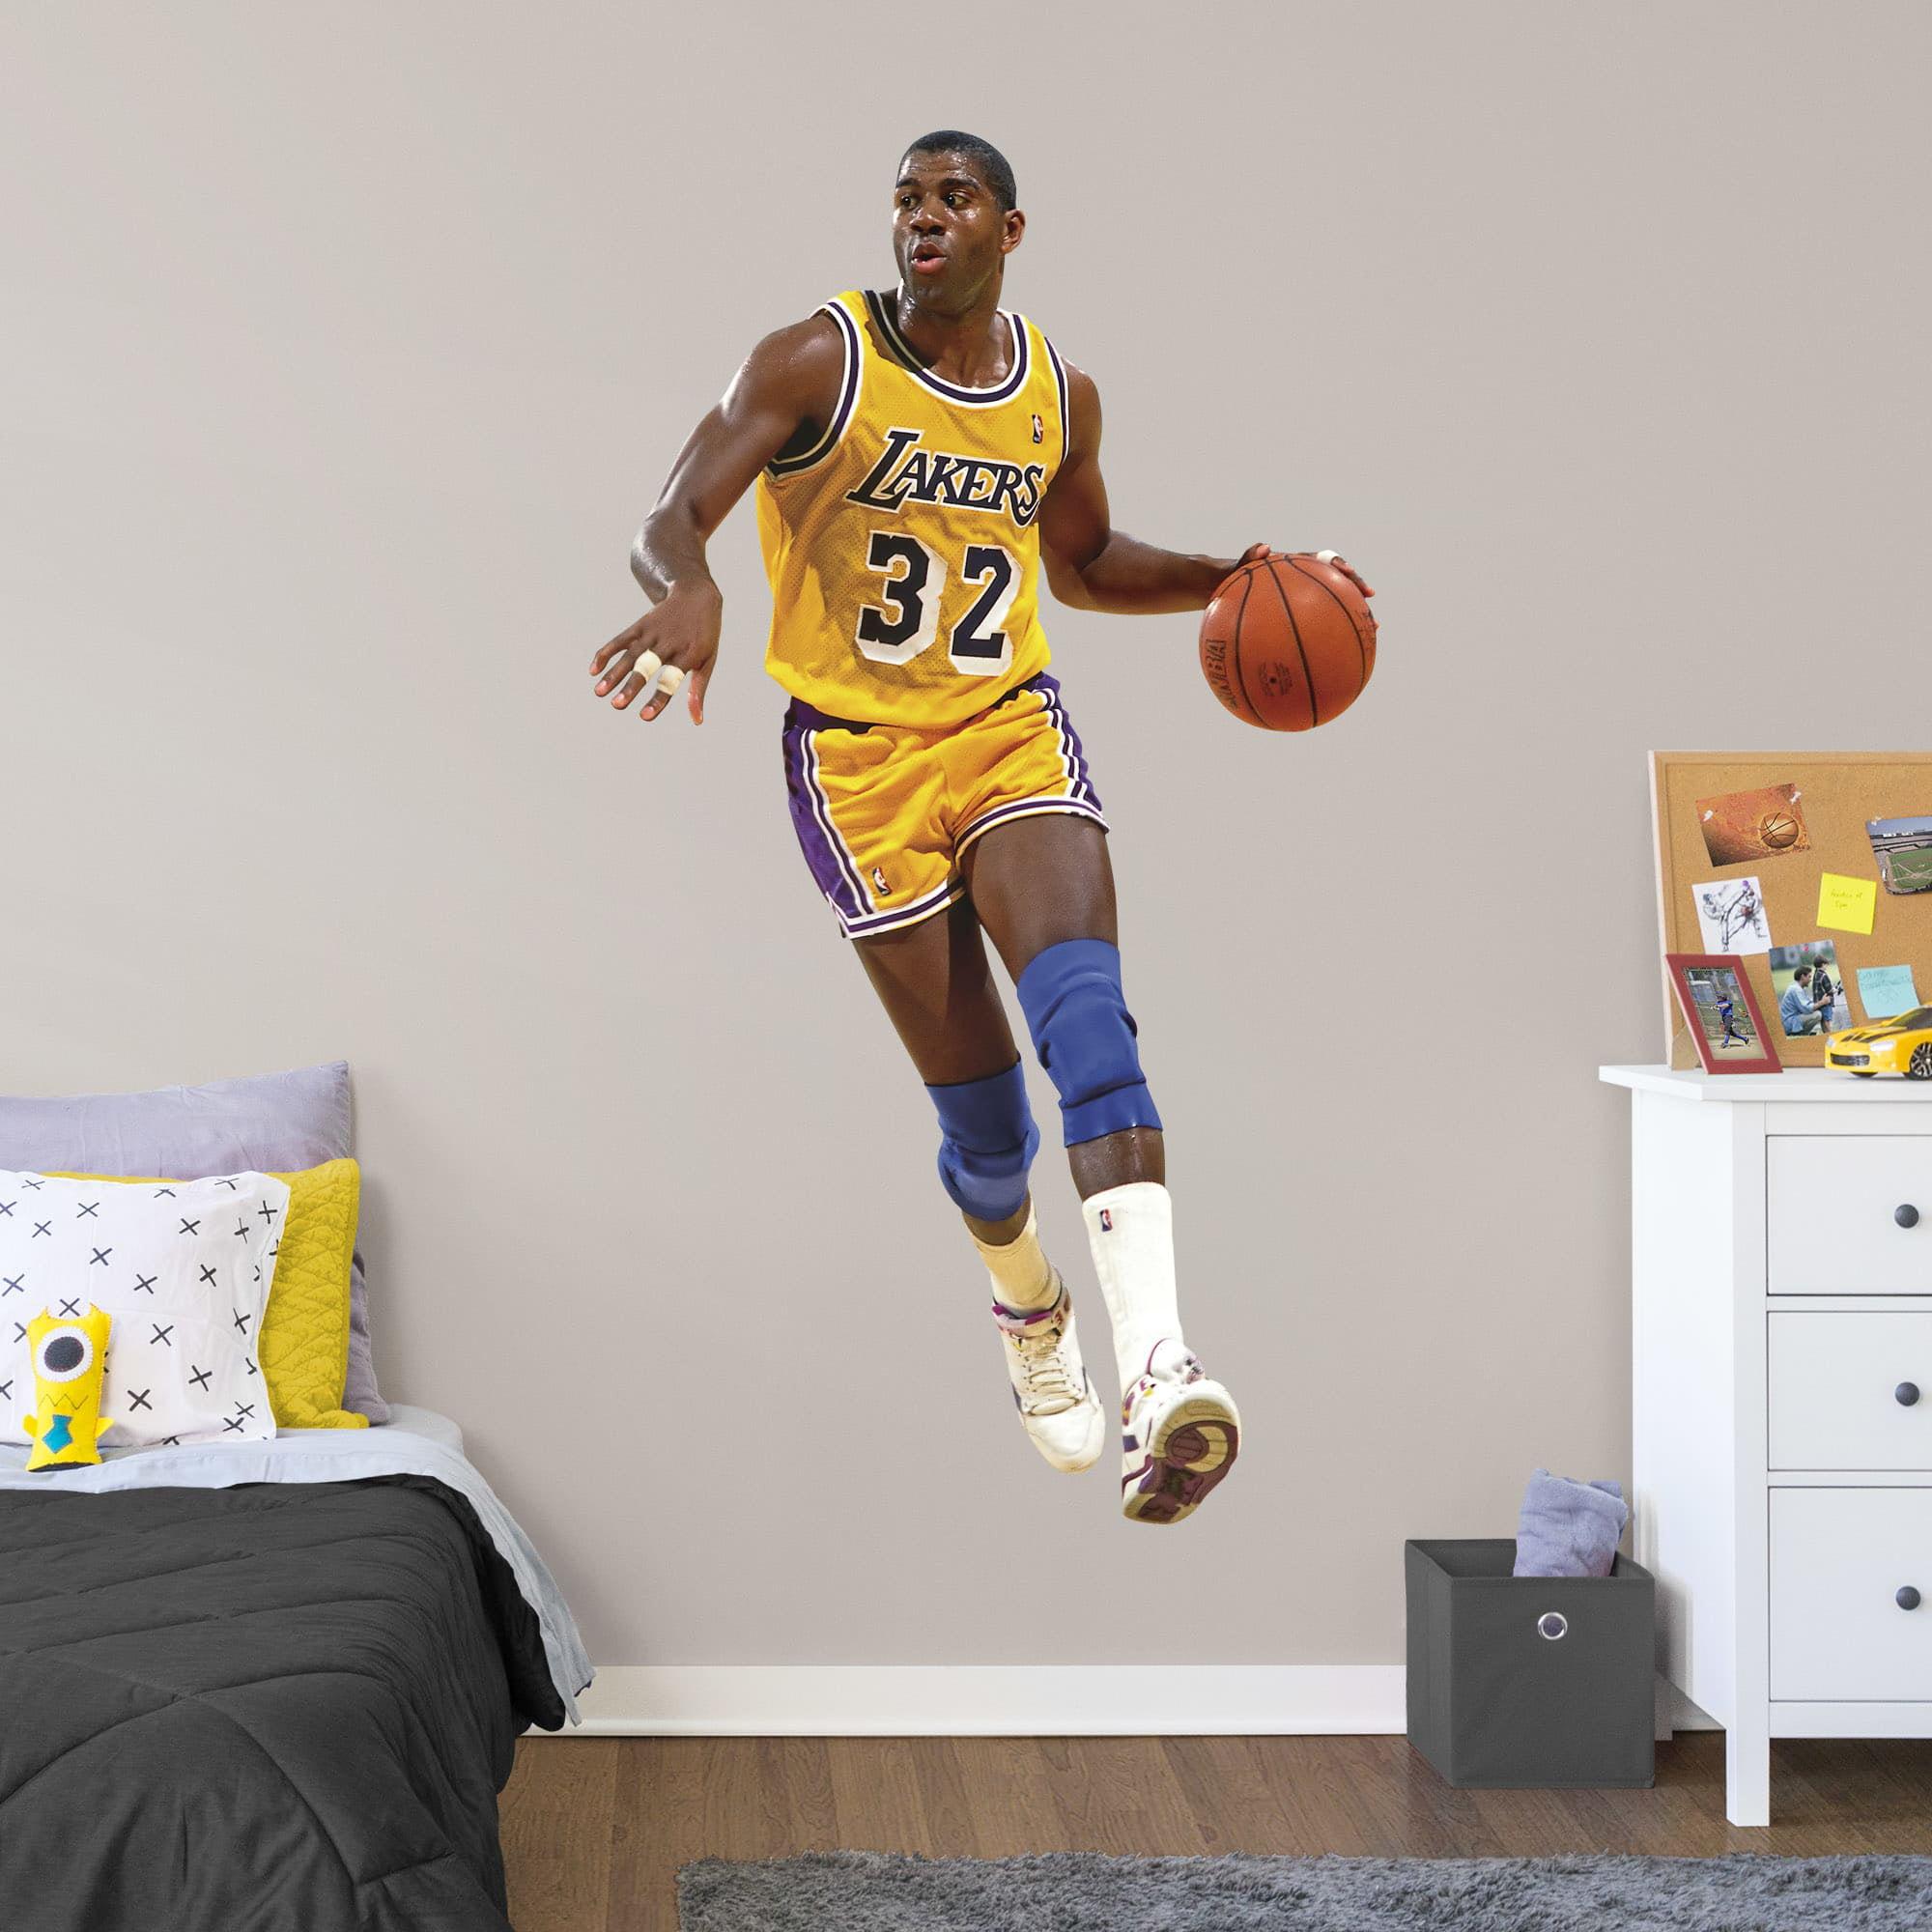 Fathead Magic Johnson Life Size Officially Licensed Nba Removable Wall Decal Walmart Com Walmart Com